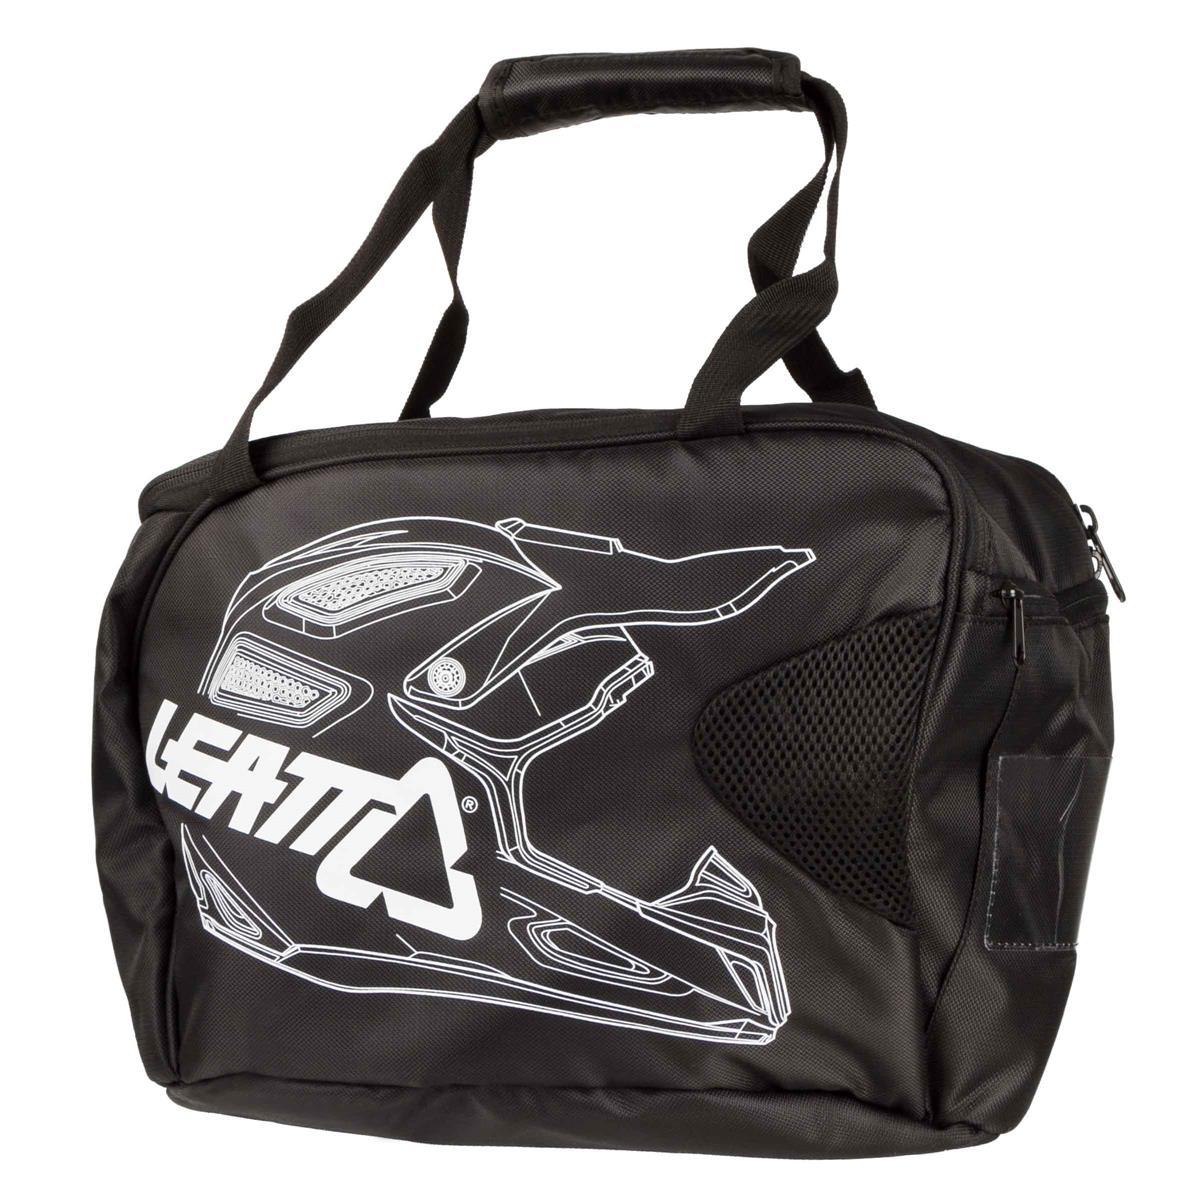 Leatt Helm-Transporttasche  Schwarz